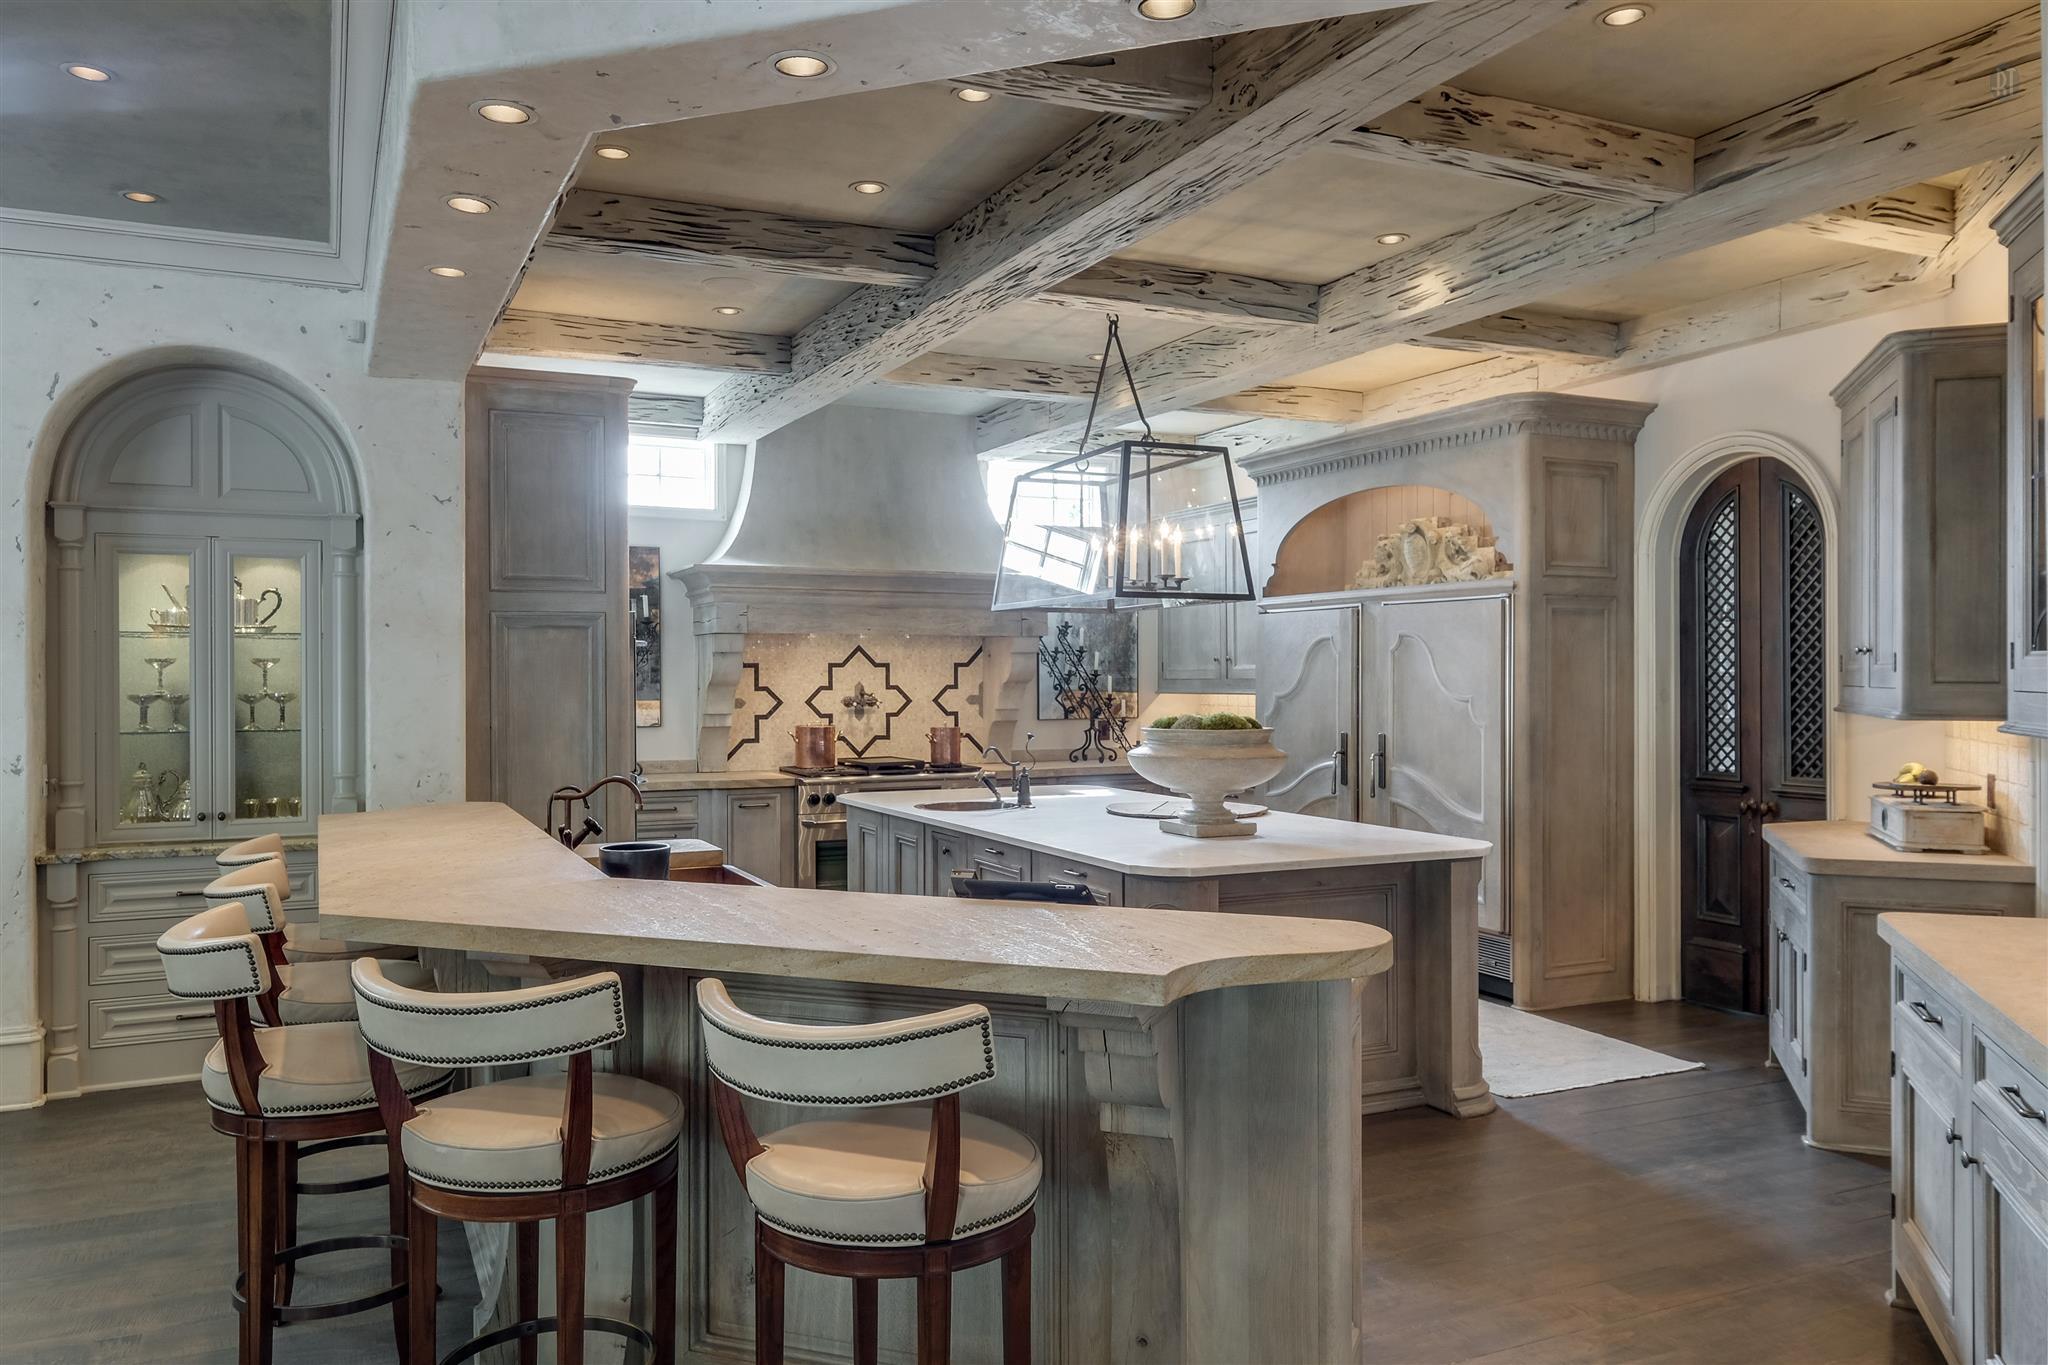 Verona, layered and rustic Venetian Plaster, by Plaster Artistry in Leisure / Breakfast Room